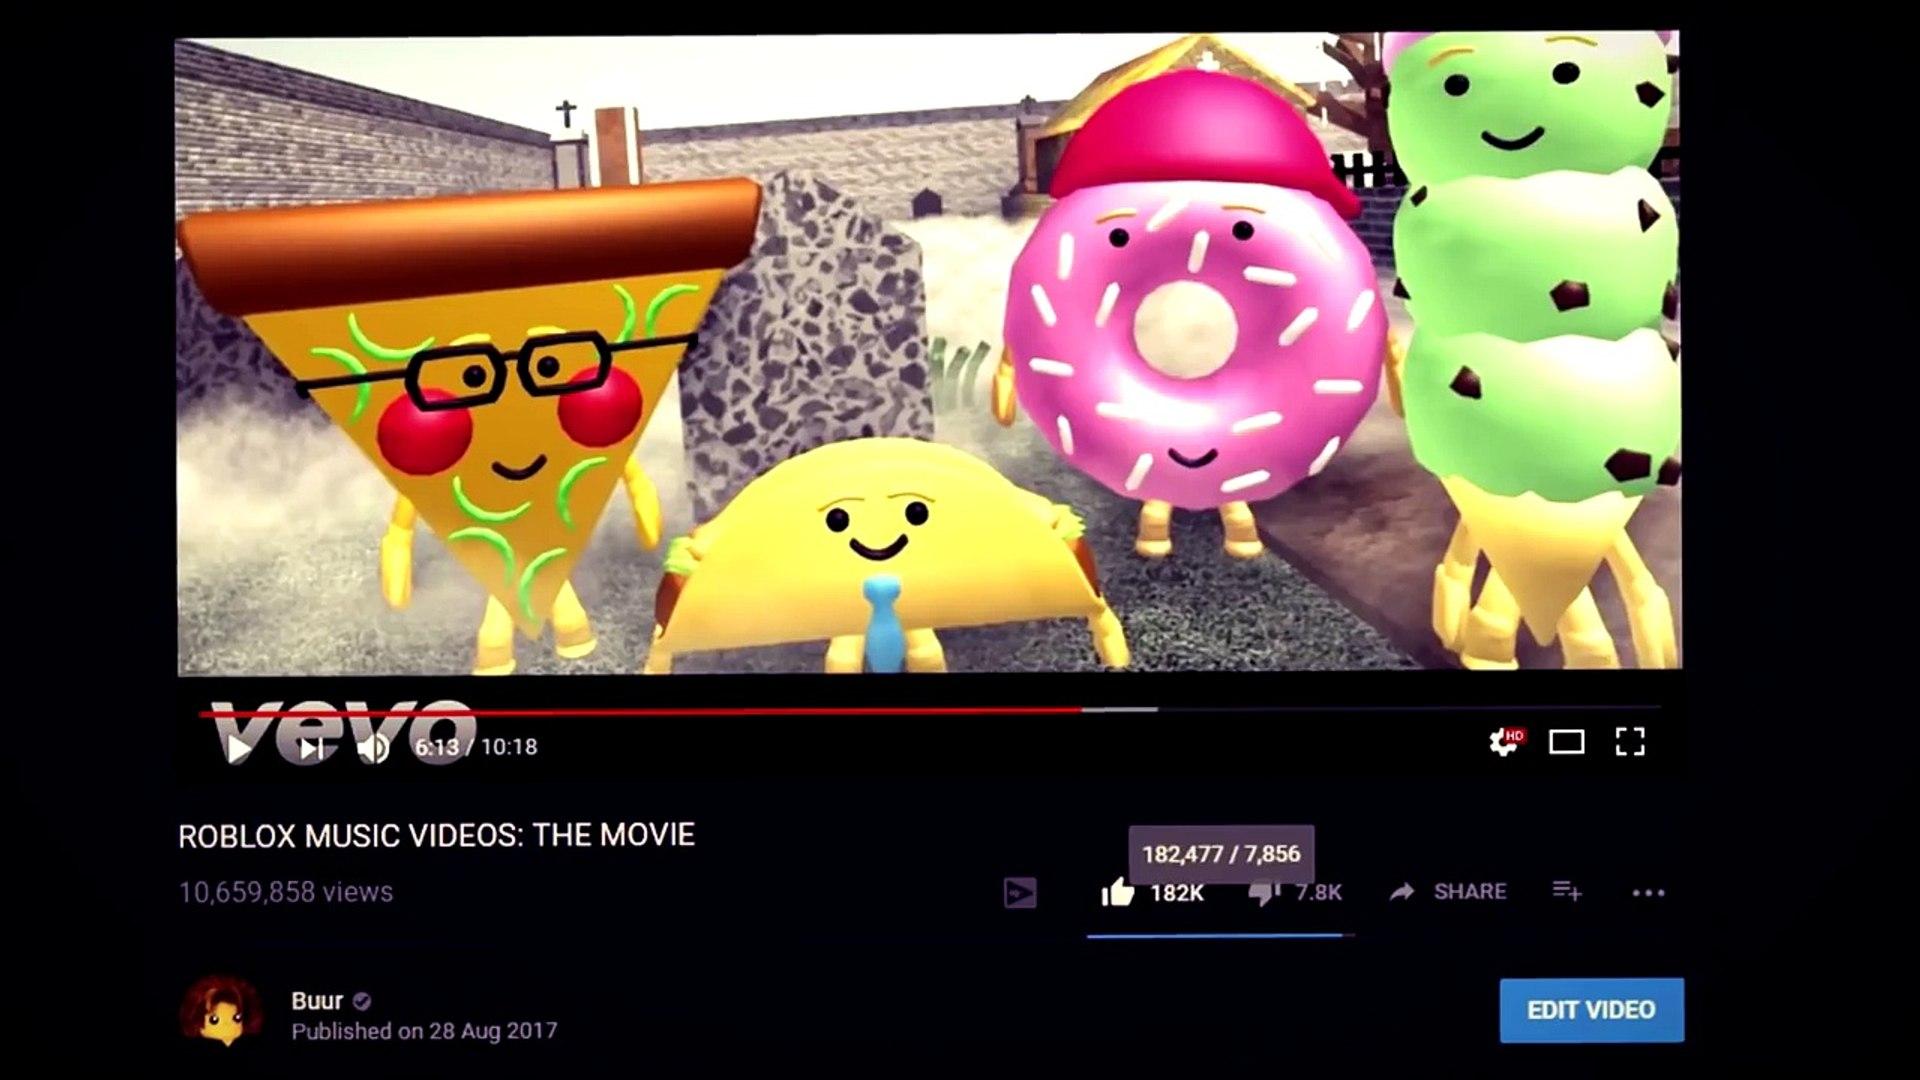 Buur Roblox Music Video 8